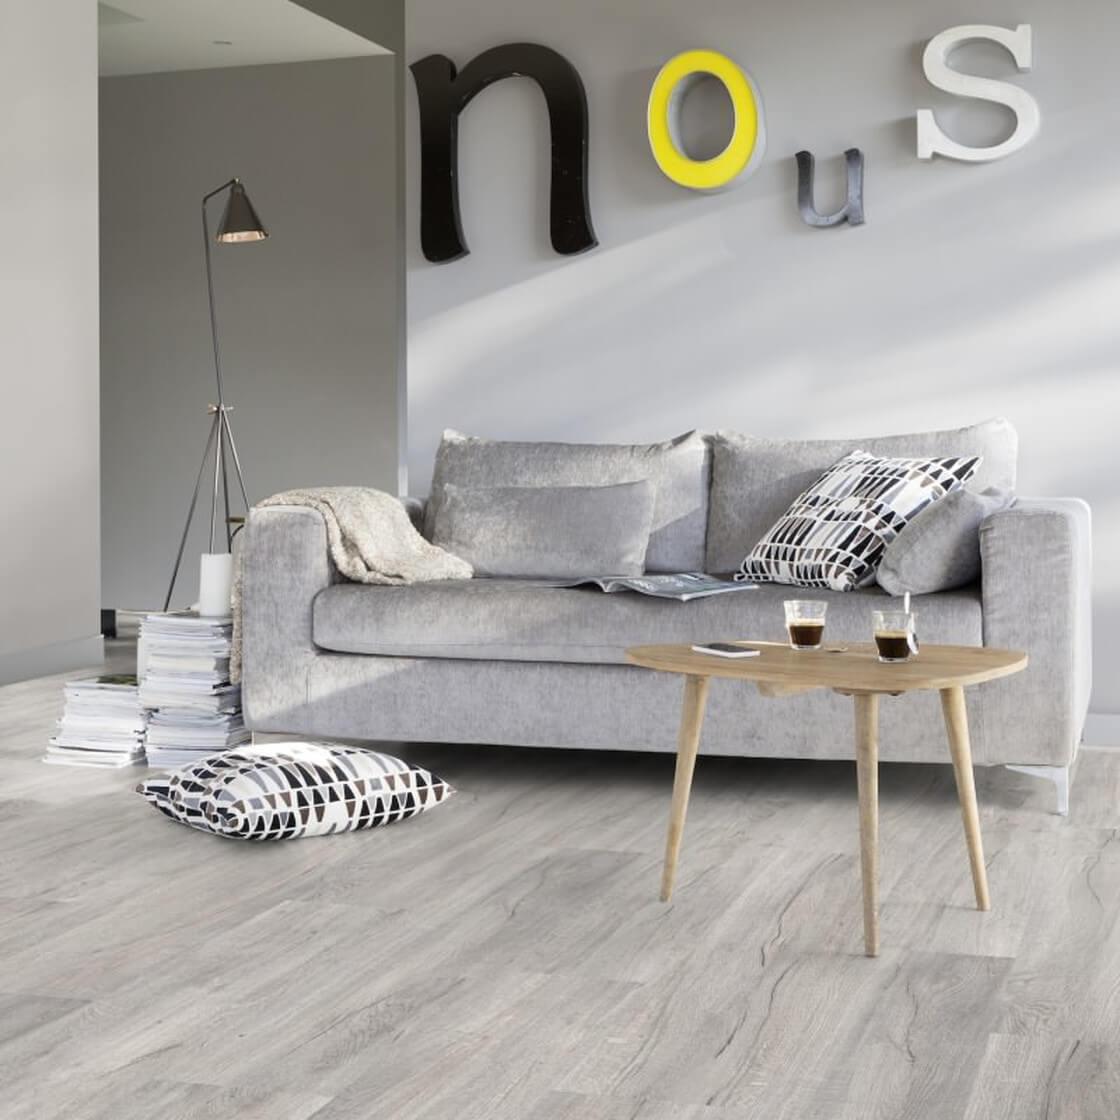 Colla Per Pavimenti Pvc kilda pearl - gerflor rigid 55 lock acoustic | pavimento pvc grigio